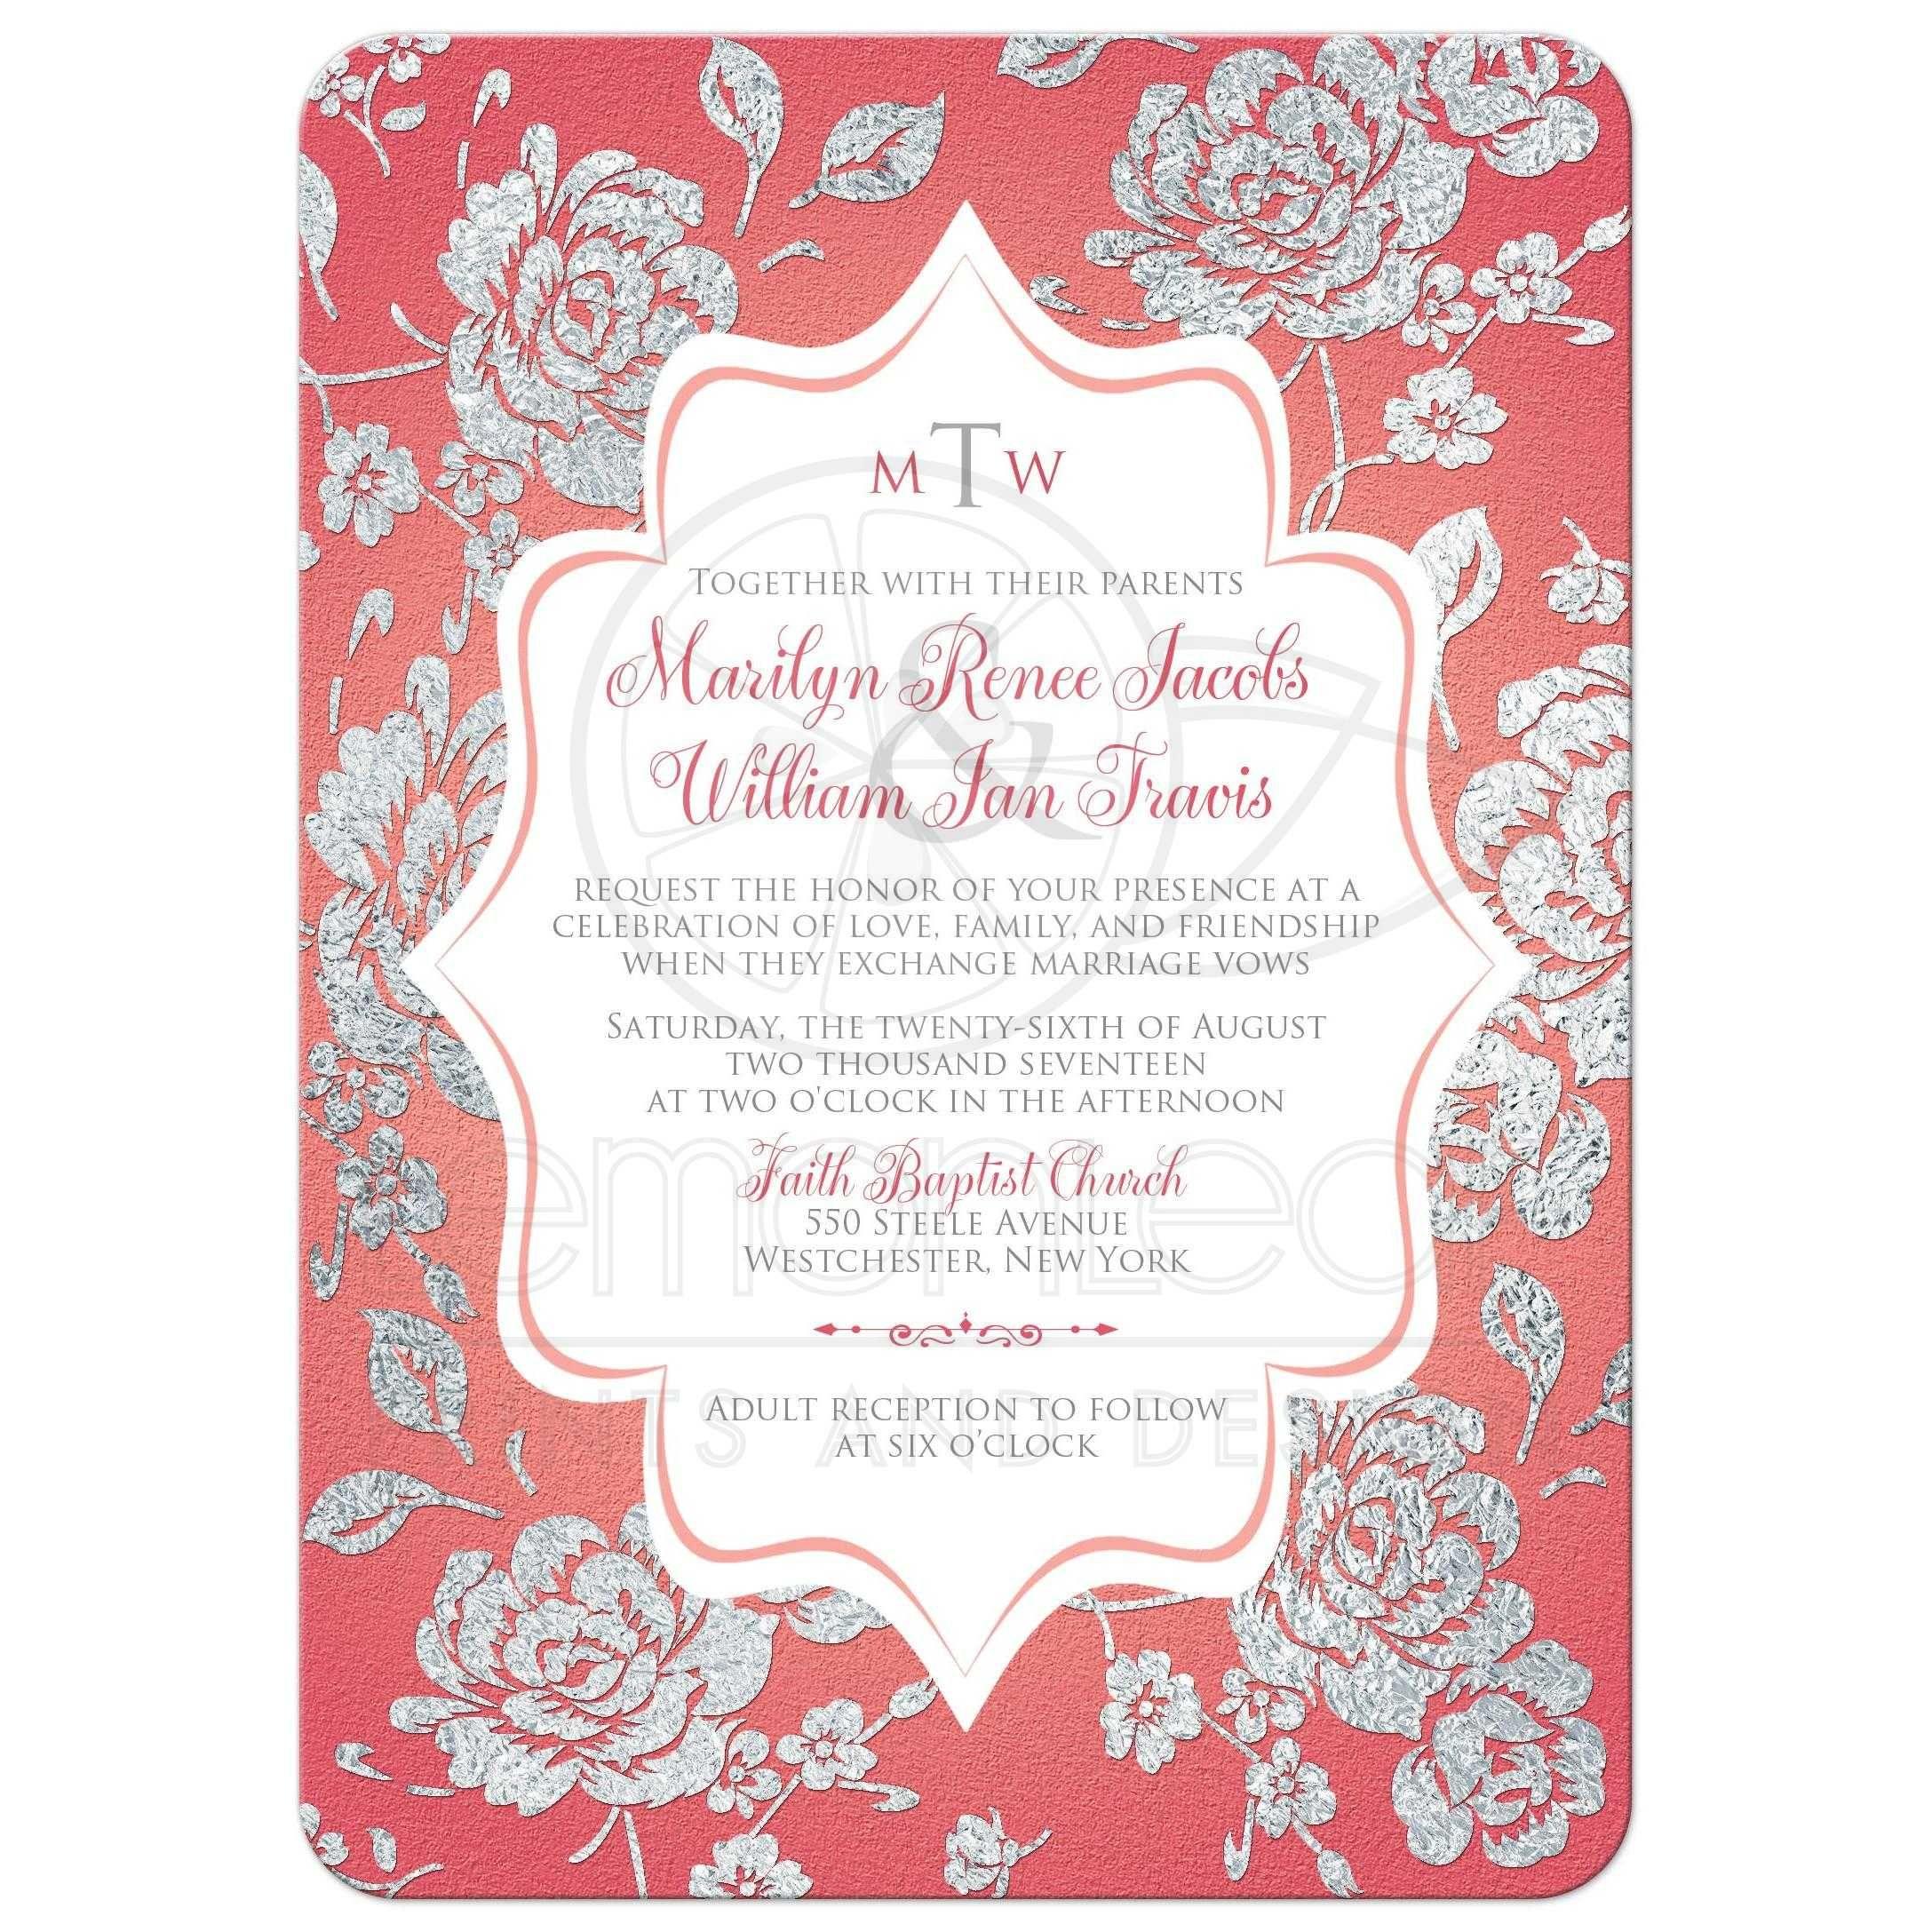 Red And Silver Wedding Invitations wedding ceremony invitation ...